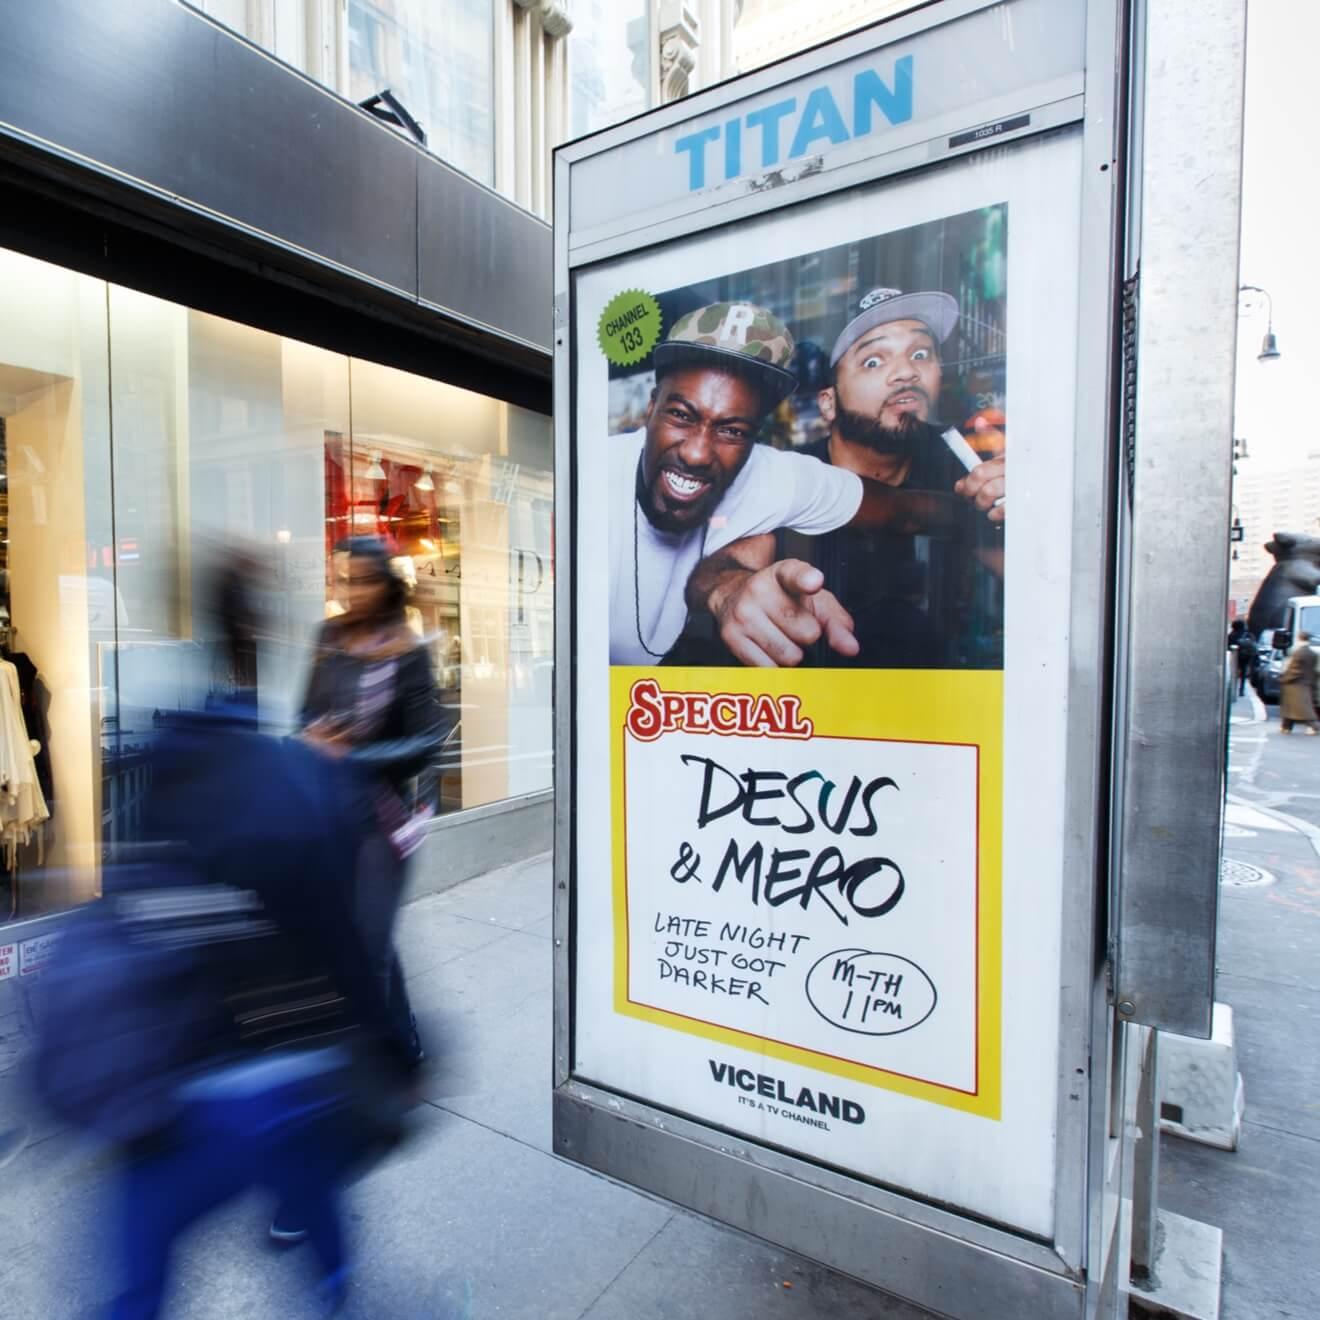 Viceland Show Marketing Desus & Mero Poster 2